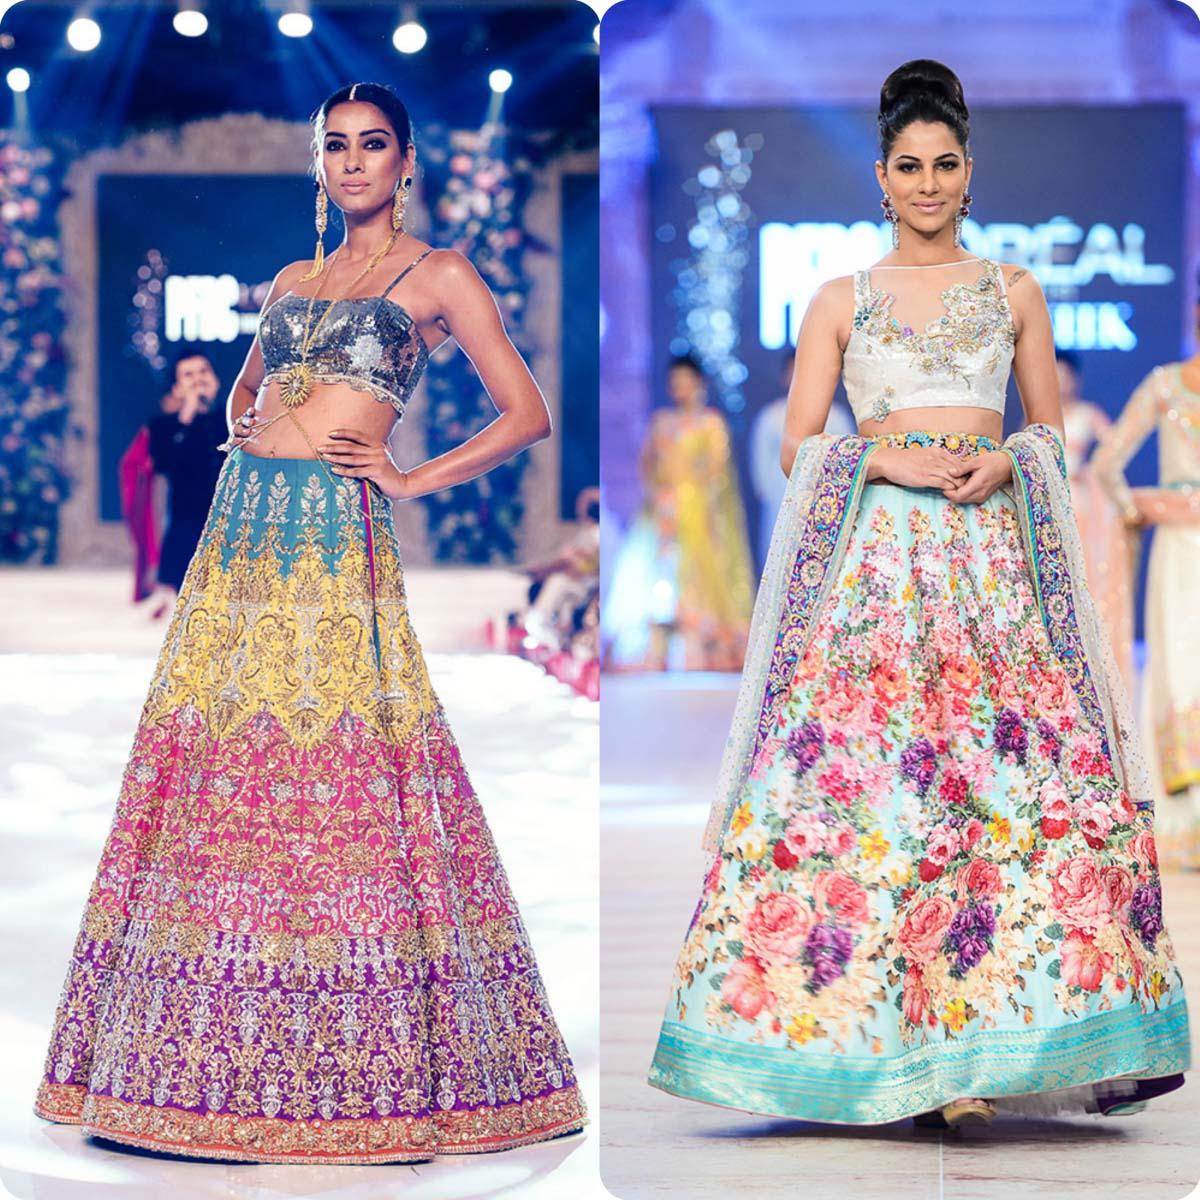 Nomi Ansari Bridal Wear Collection Ft-Junaid Khan & Maya Ali 2016-17 (2)